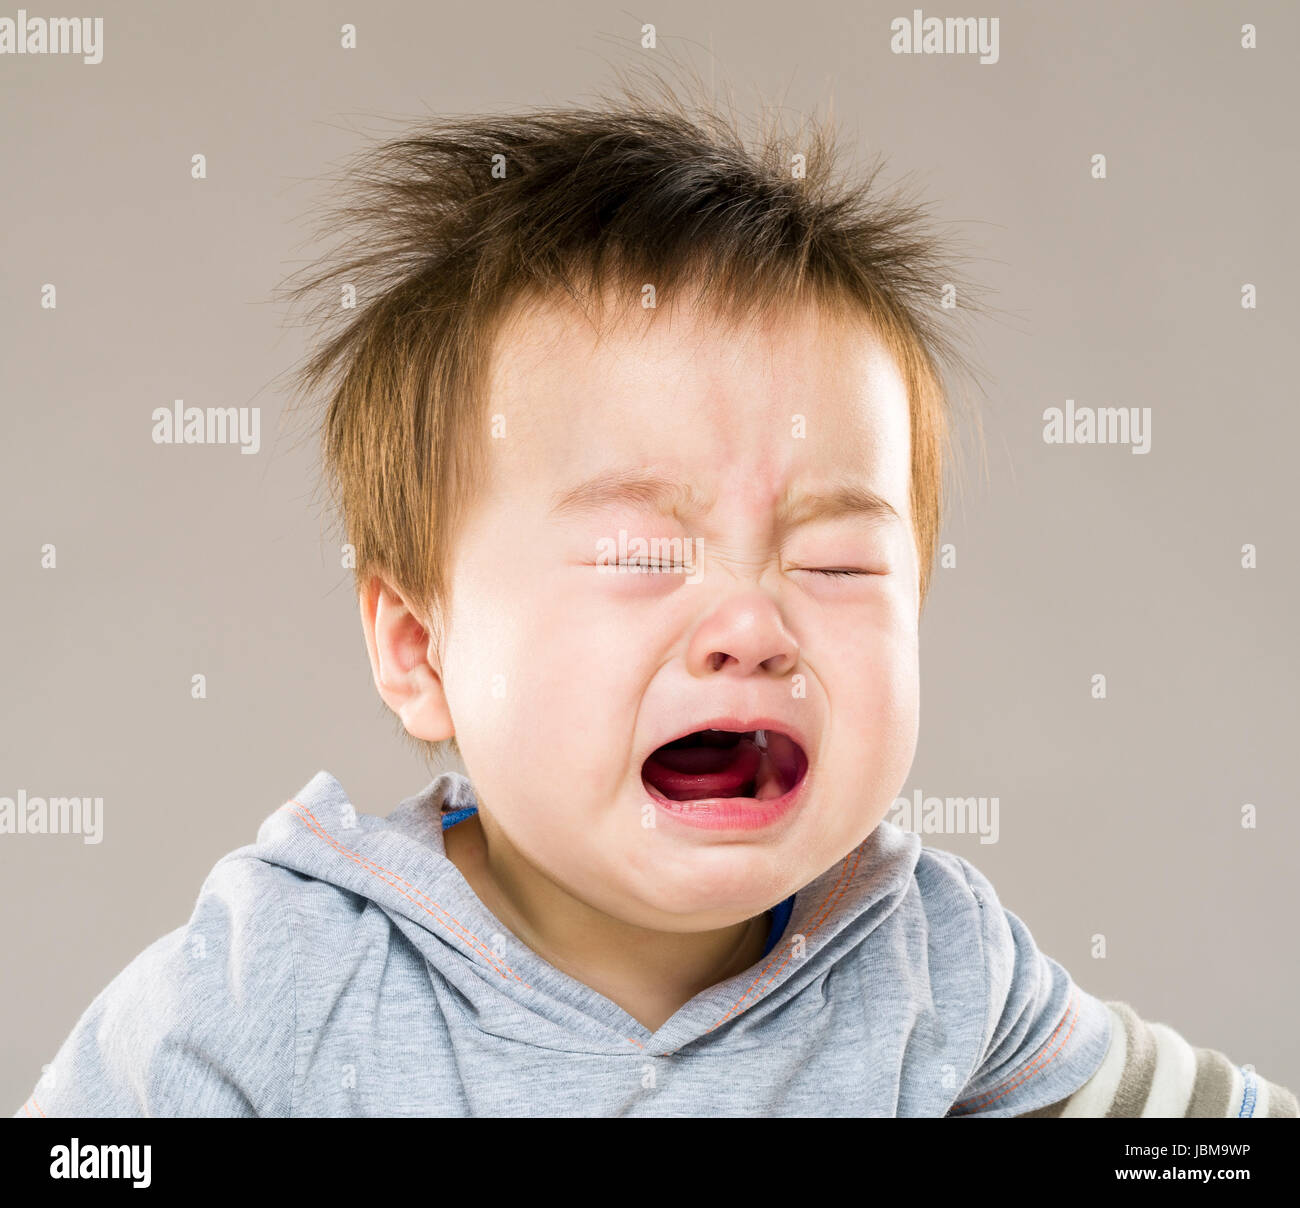 Crying baby boy - Stock Image